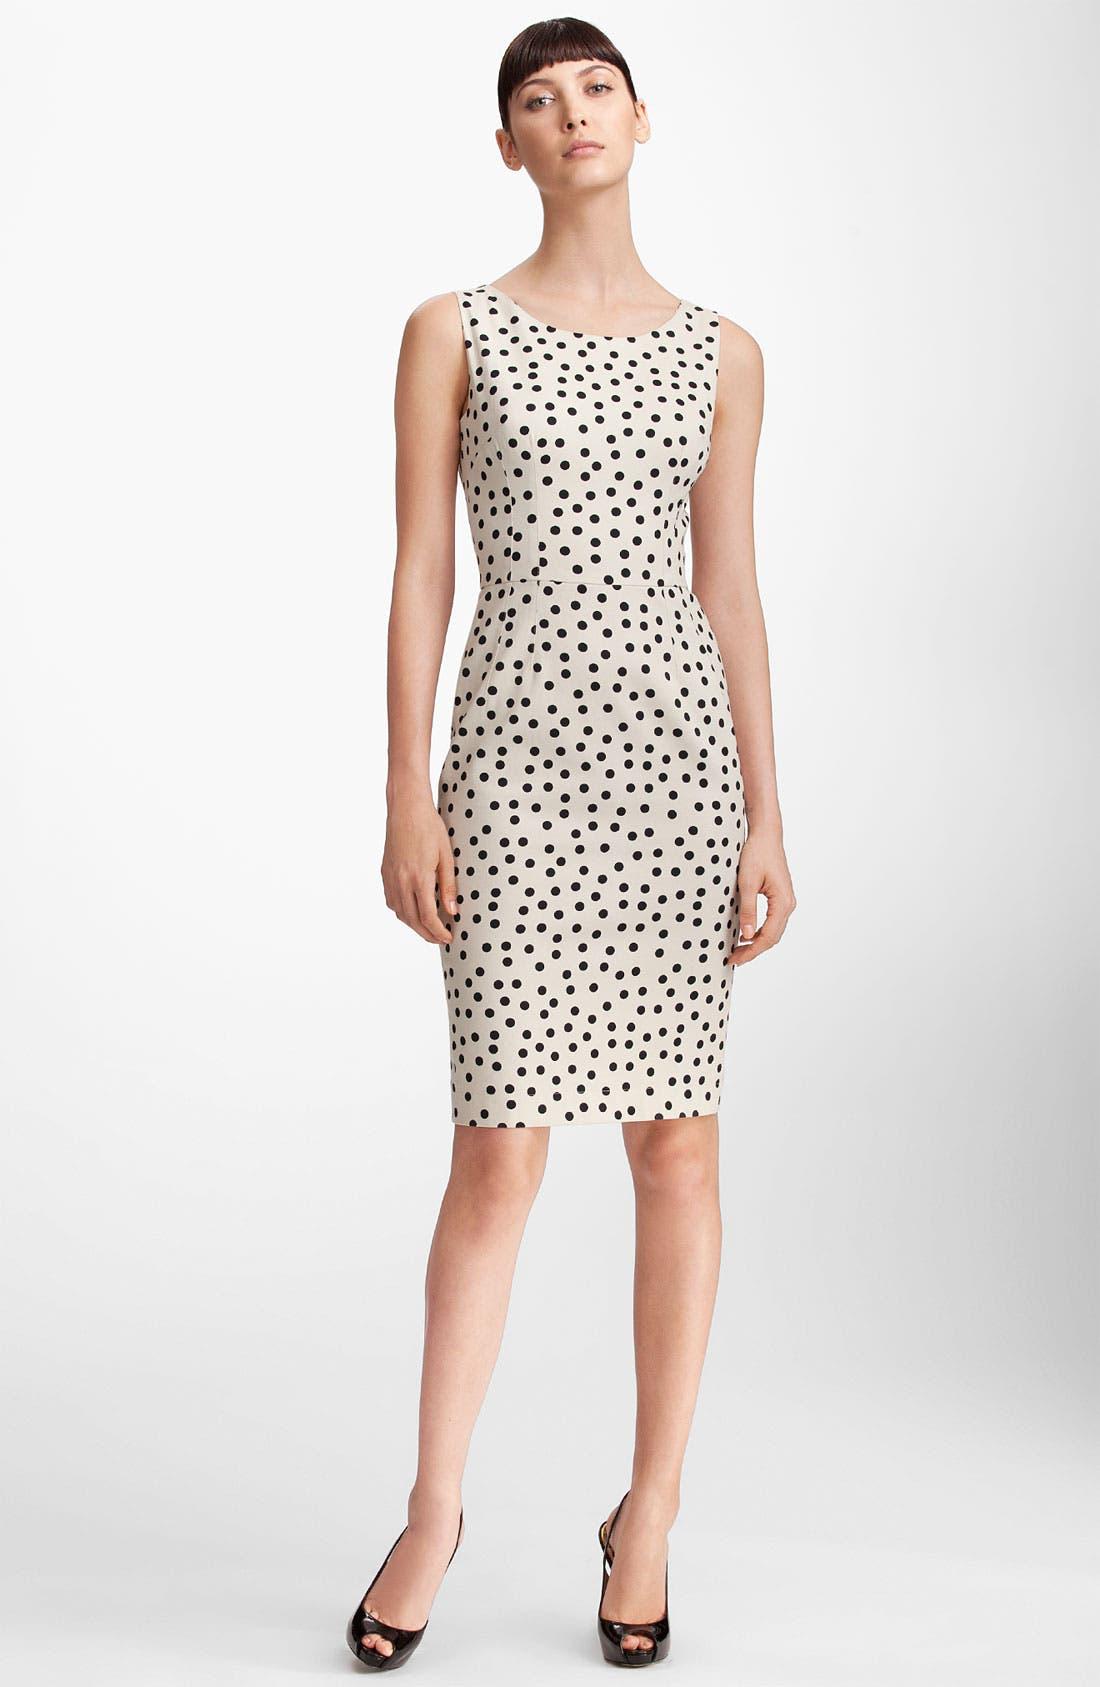 Alternate Image 1 Selected - Dolce&Gabbana Polka Dot Stretch Cotton Dress